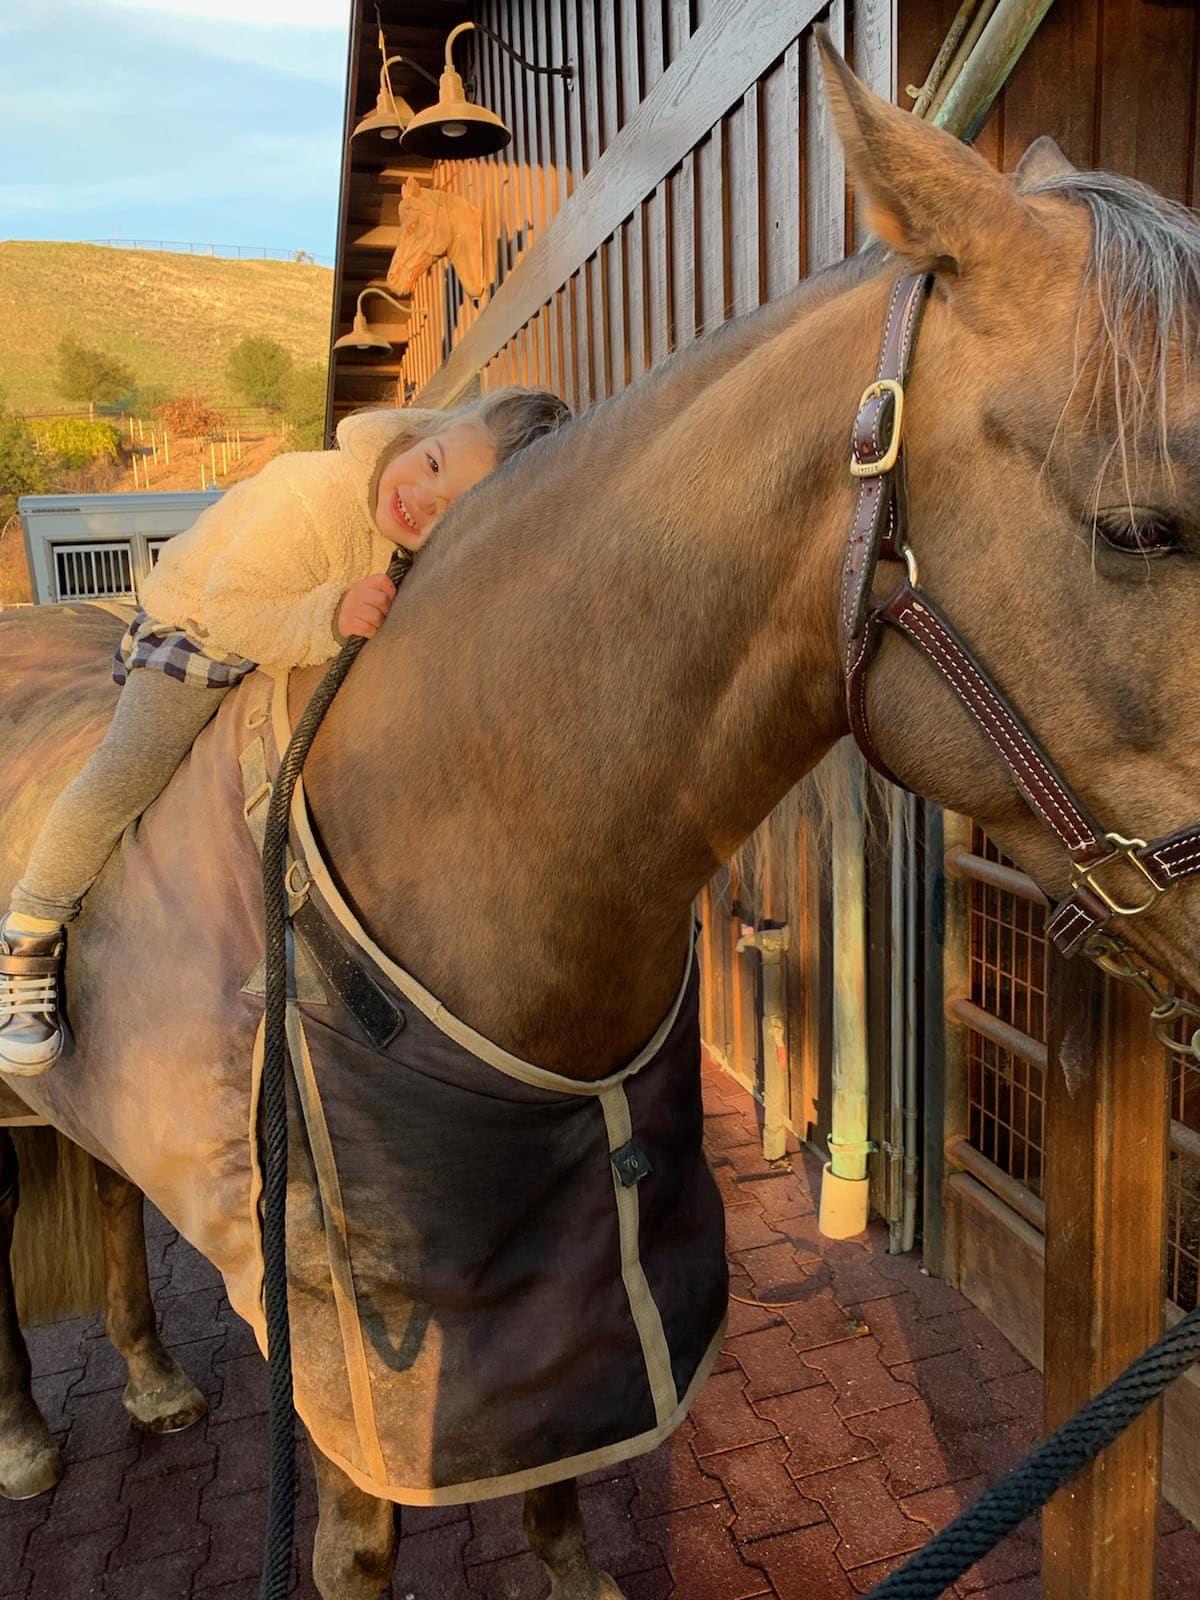 Cindy Hattersley's granddaughter hugging horse 2021